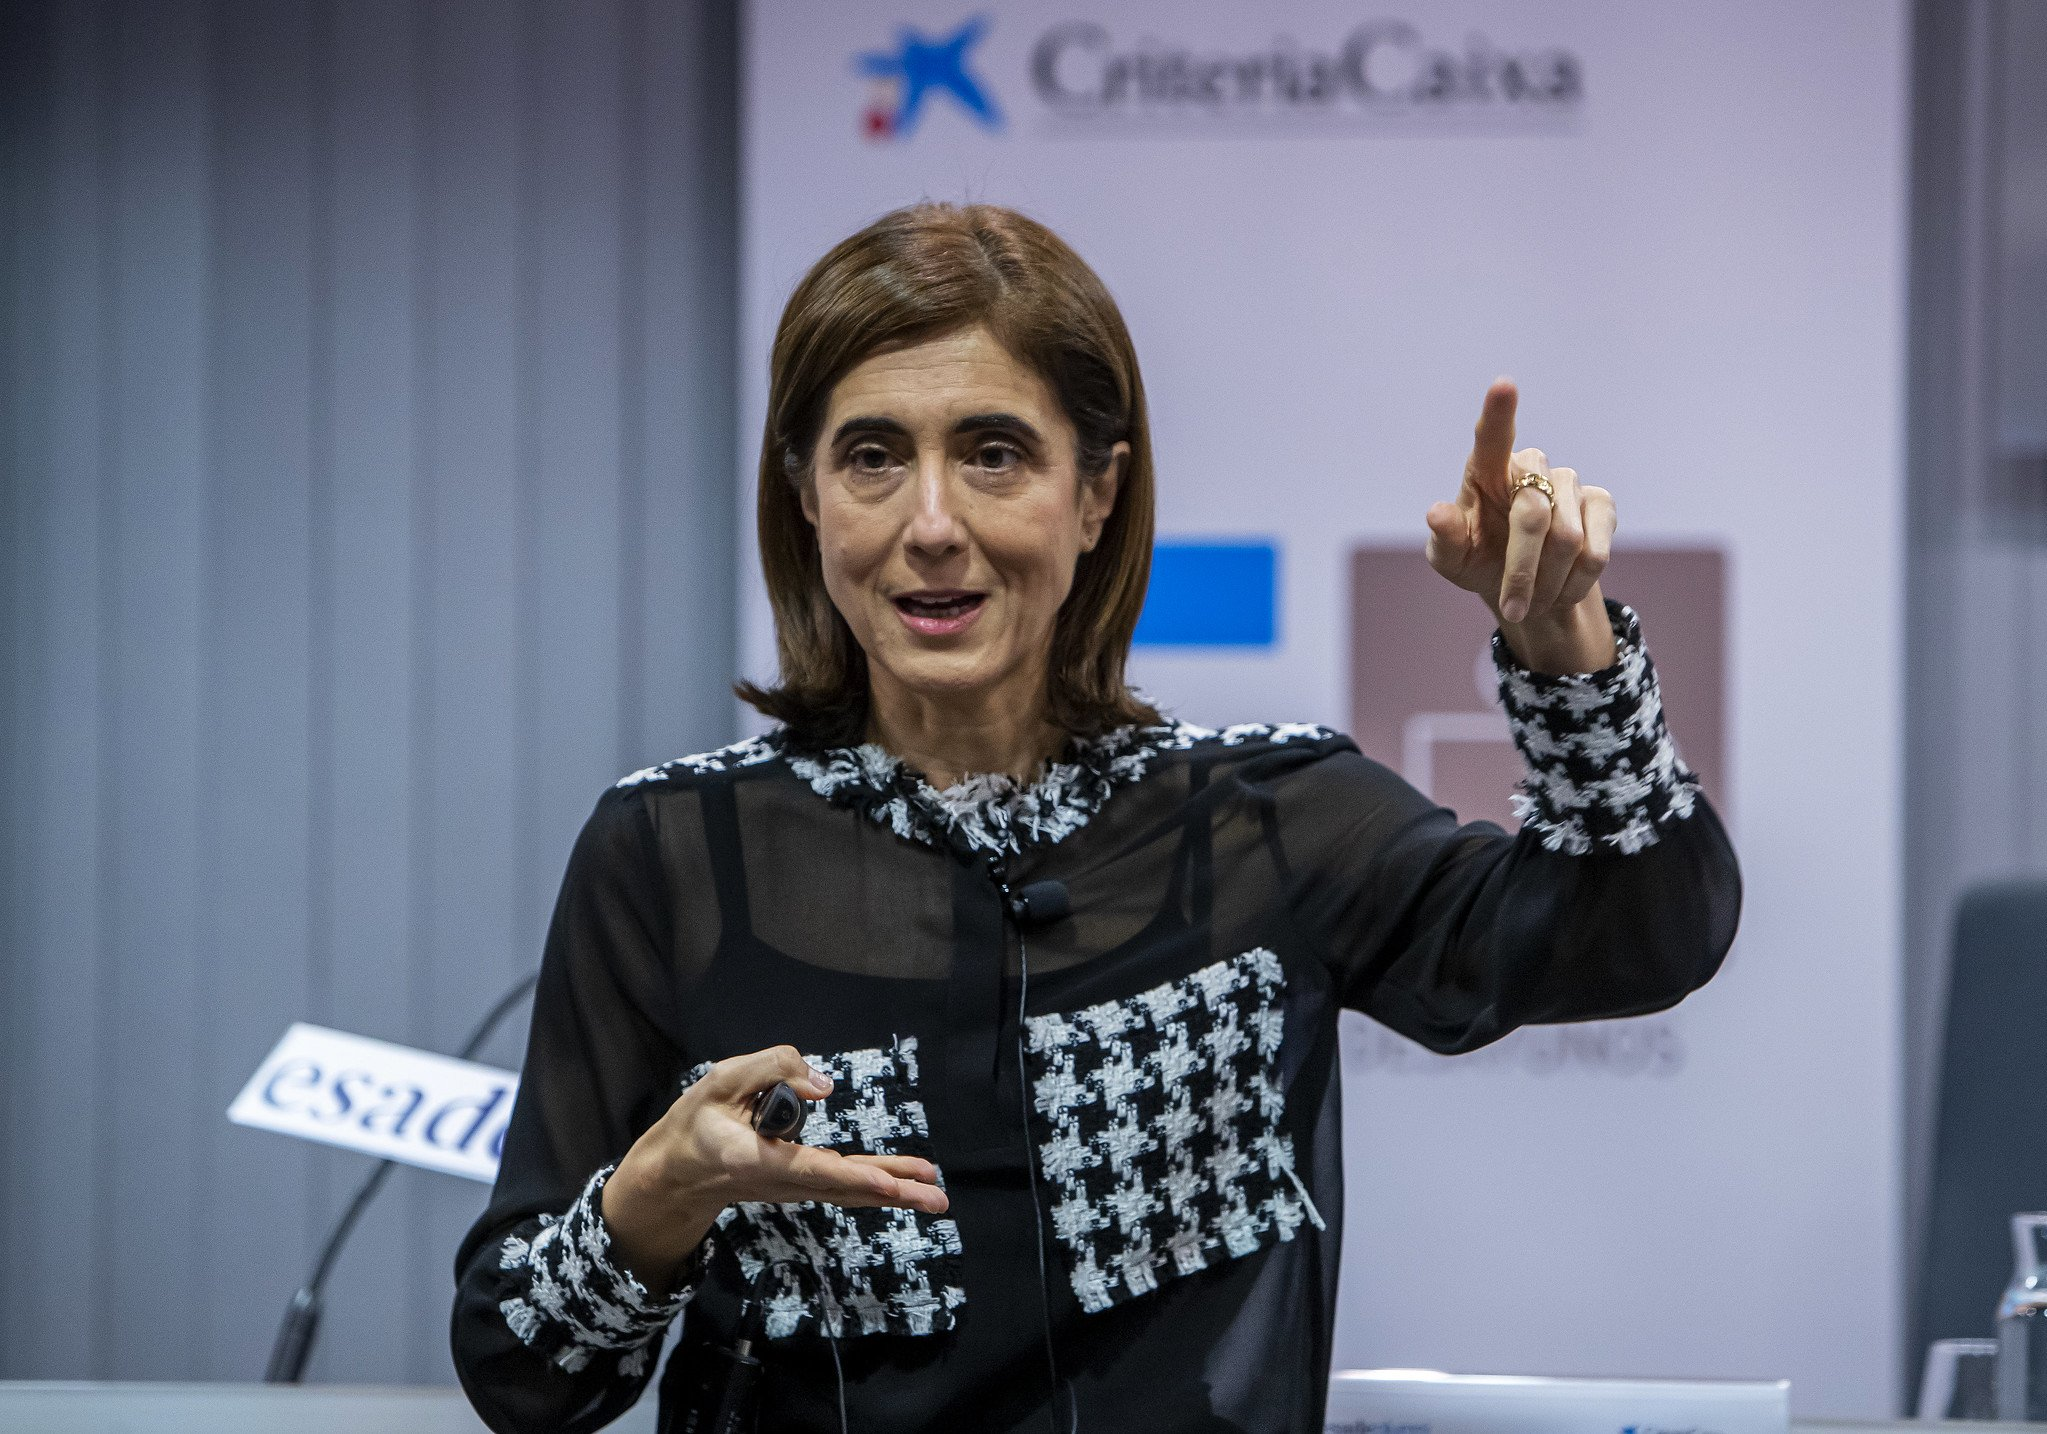 La presidenta de Microsoft en España, Pilar López